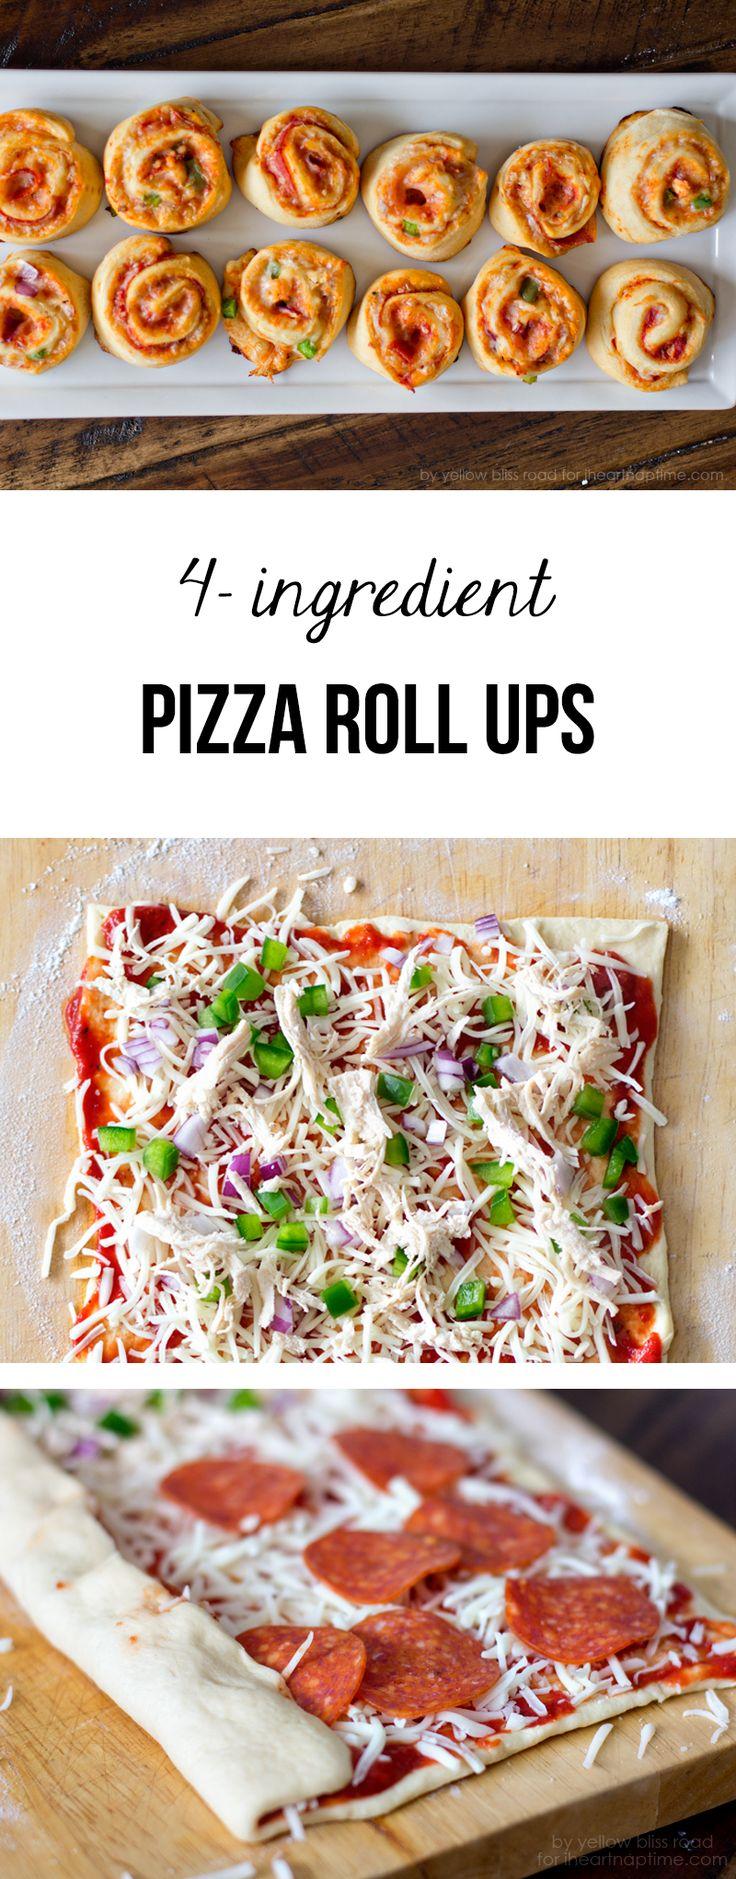 Quick dinner or snack idea. Simple 4 ingredient dinner idea!